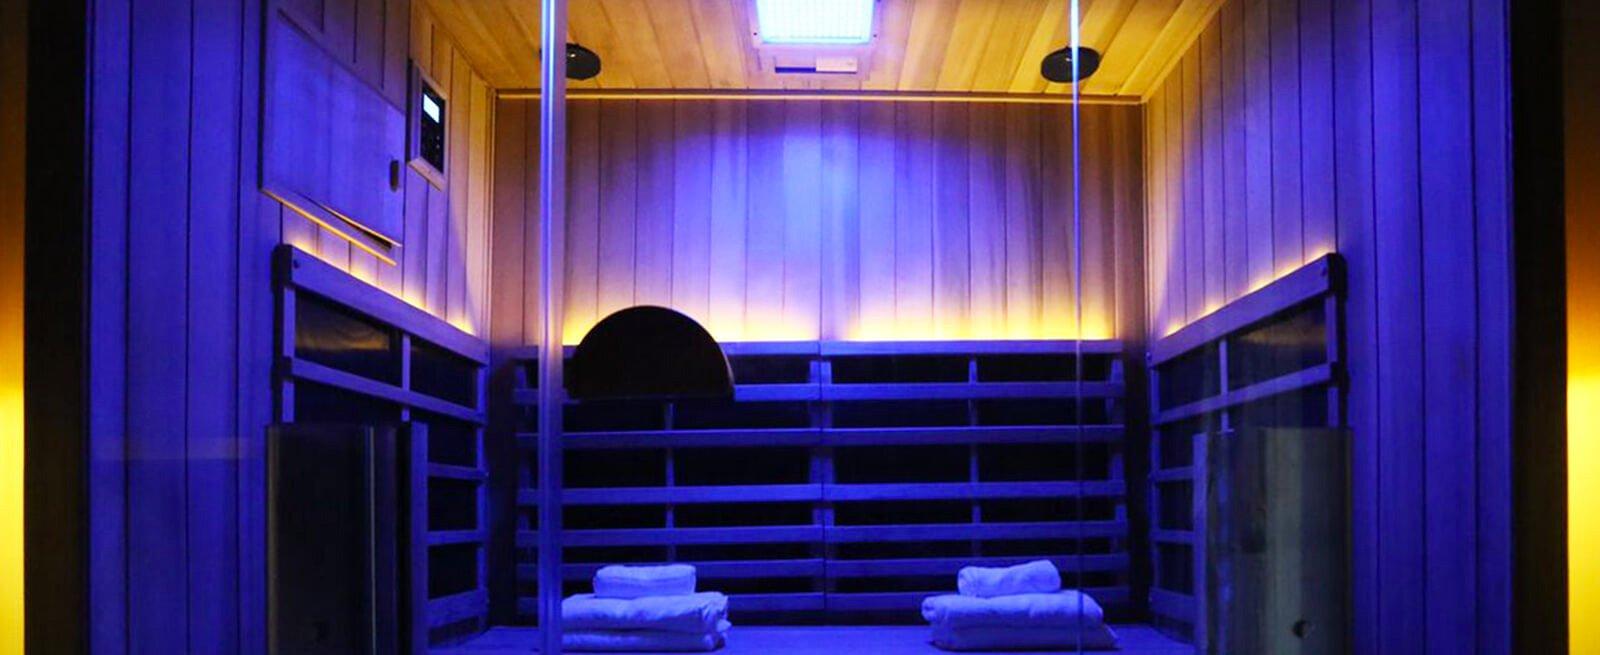 02-group-sauna-orange-county-infrared-sauna